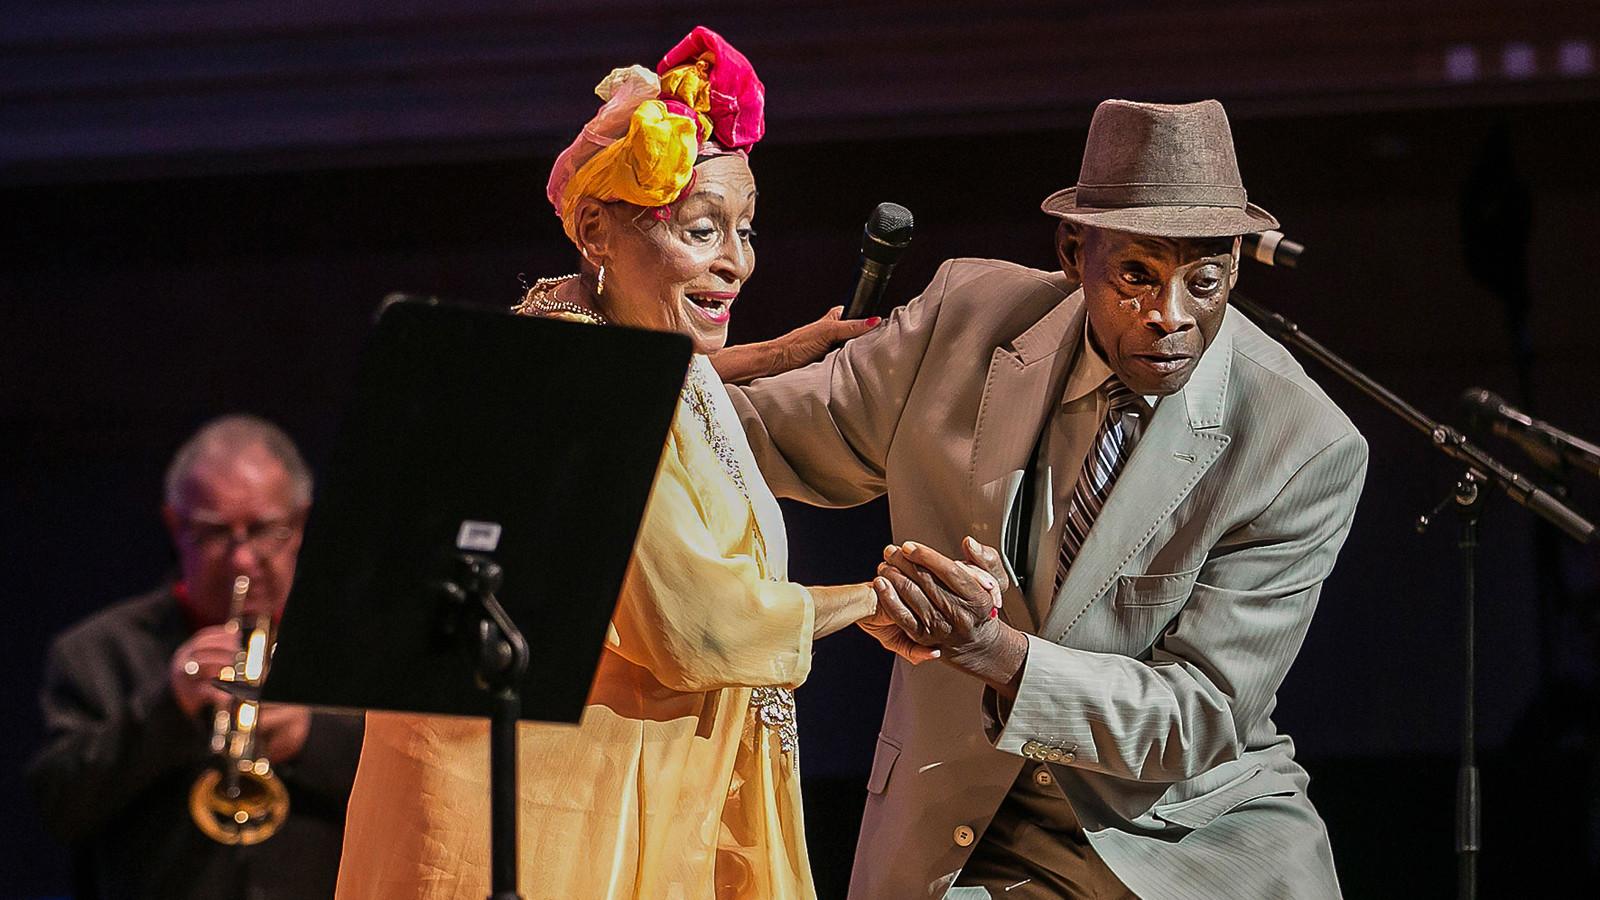 'Buena Vista Social Club: Adios' returns Cuban musicians to spotlight